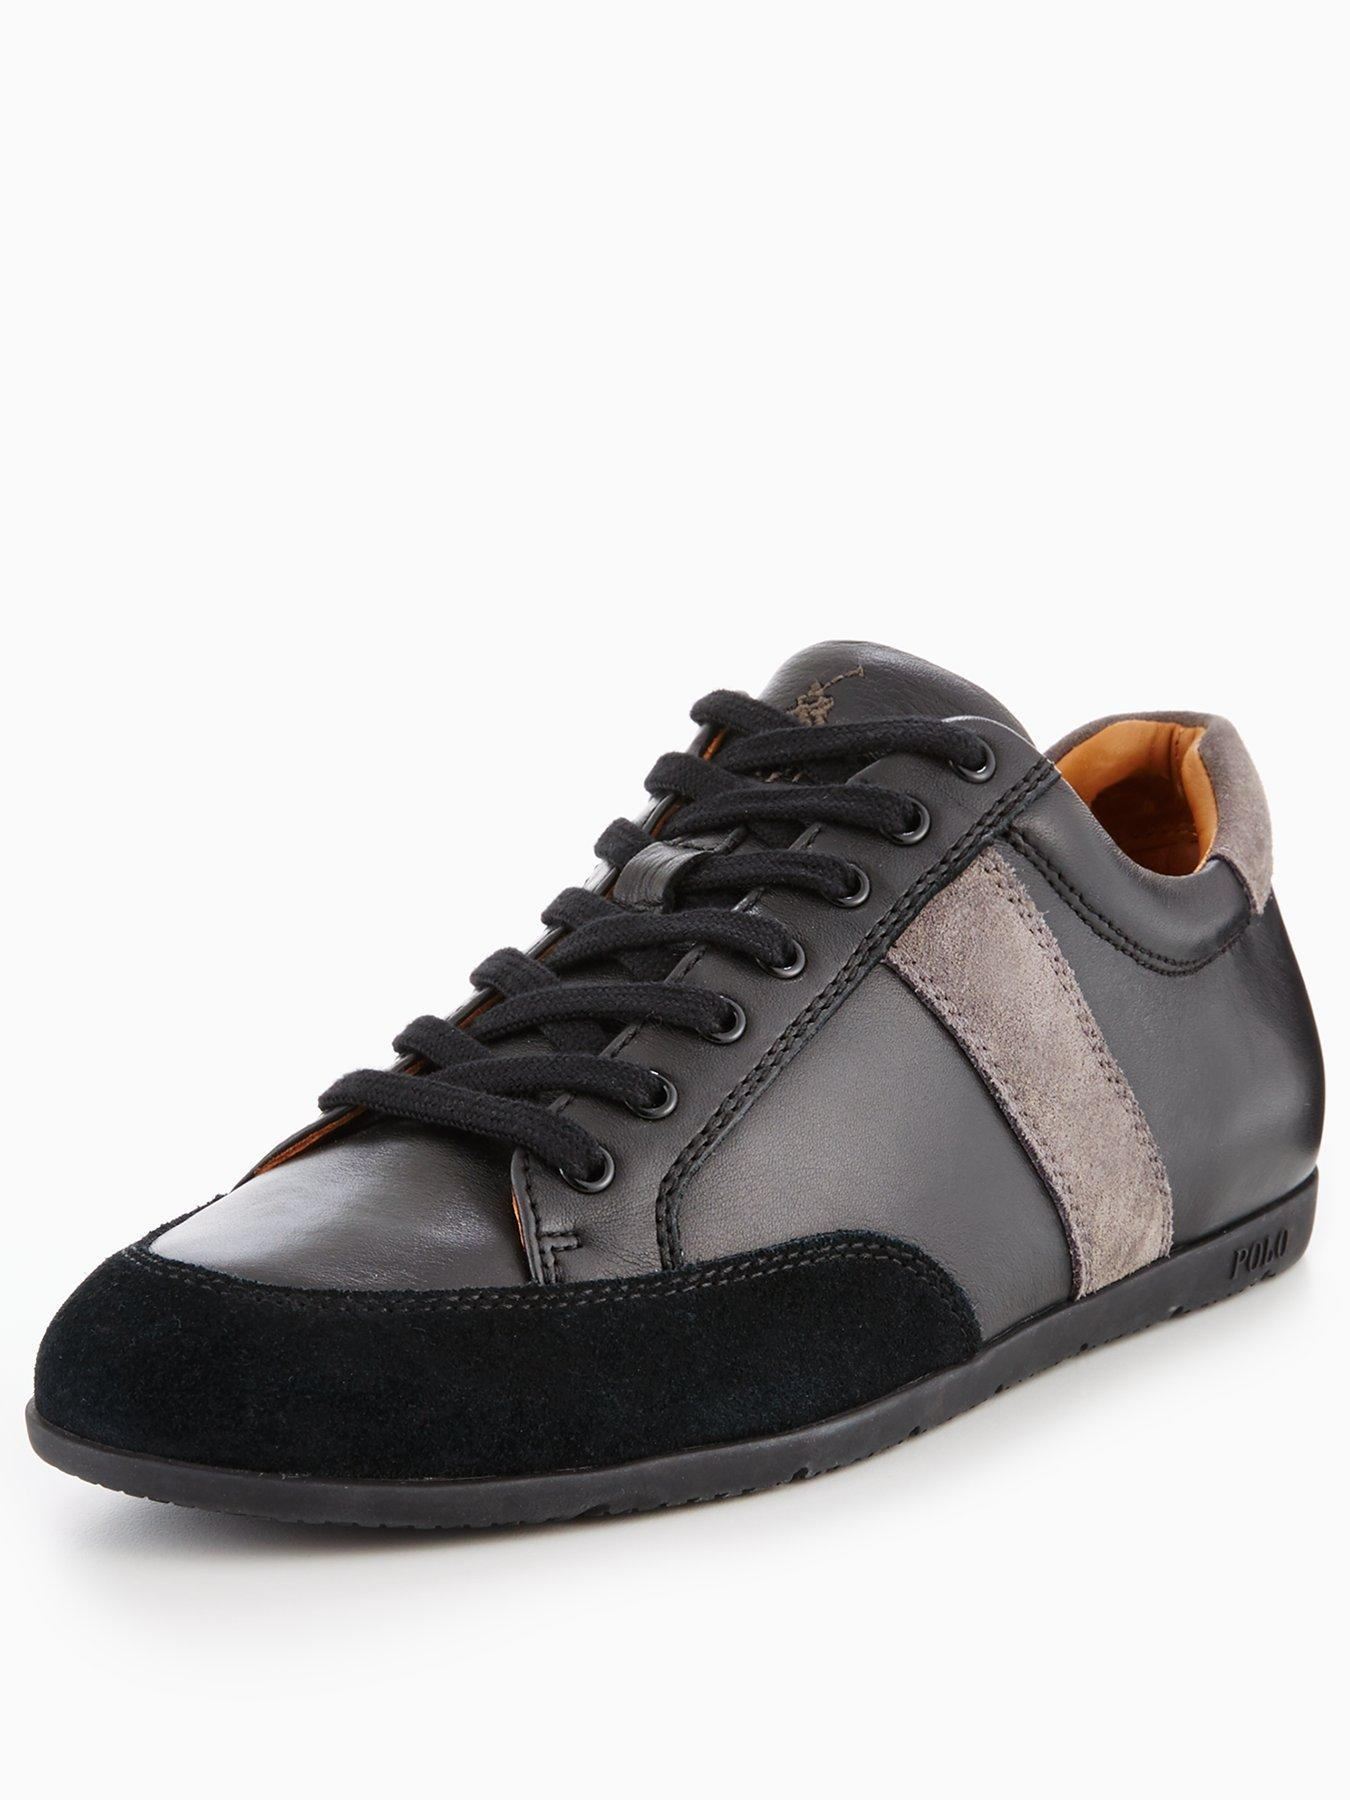 polo ralph lauren shoes photoshoot studio boys